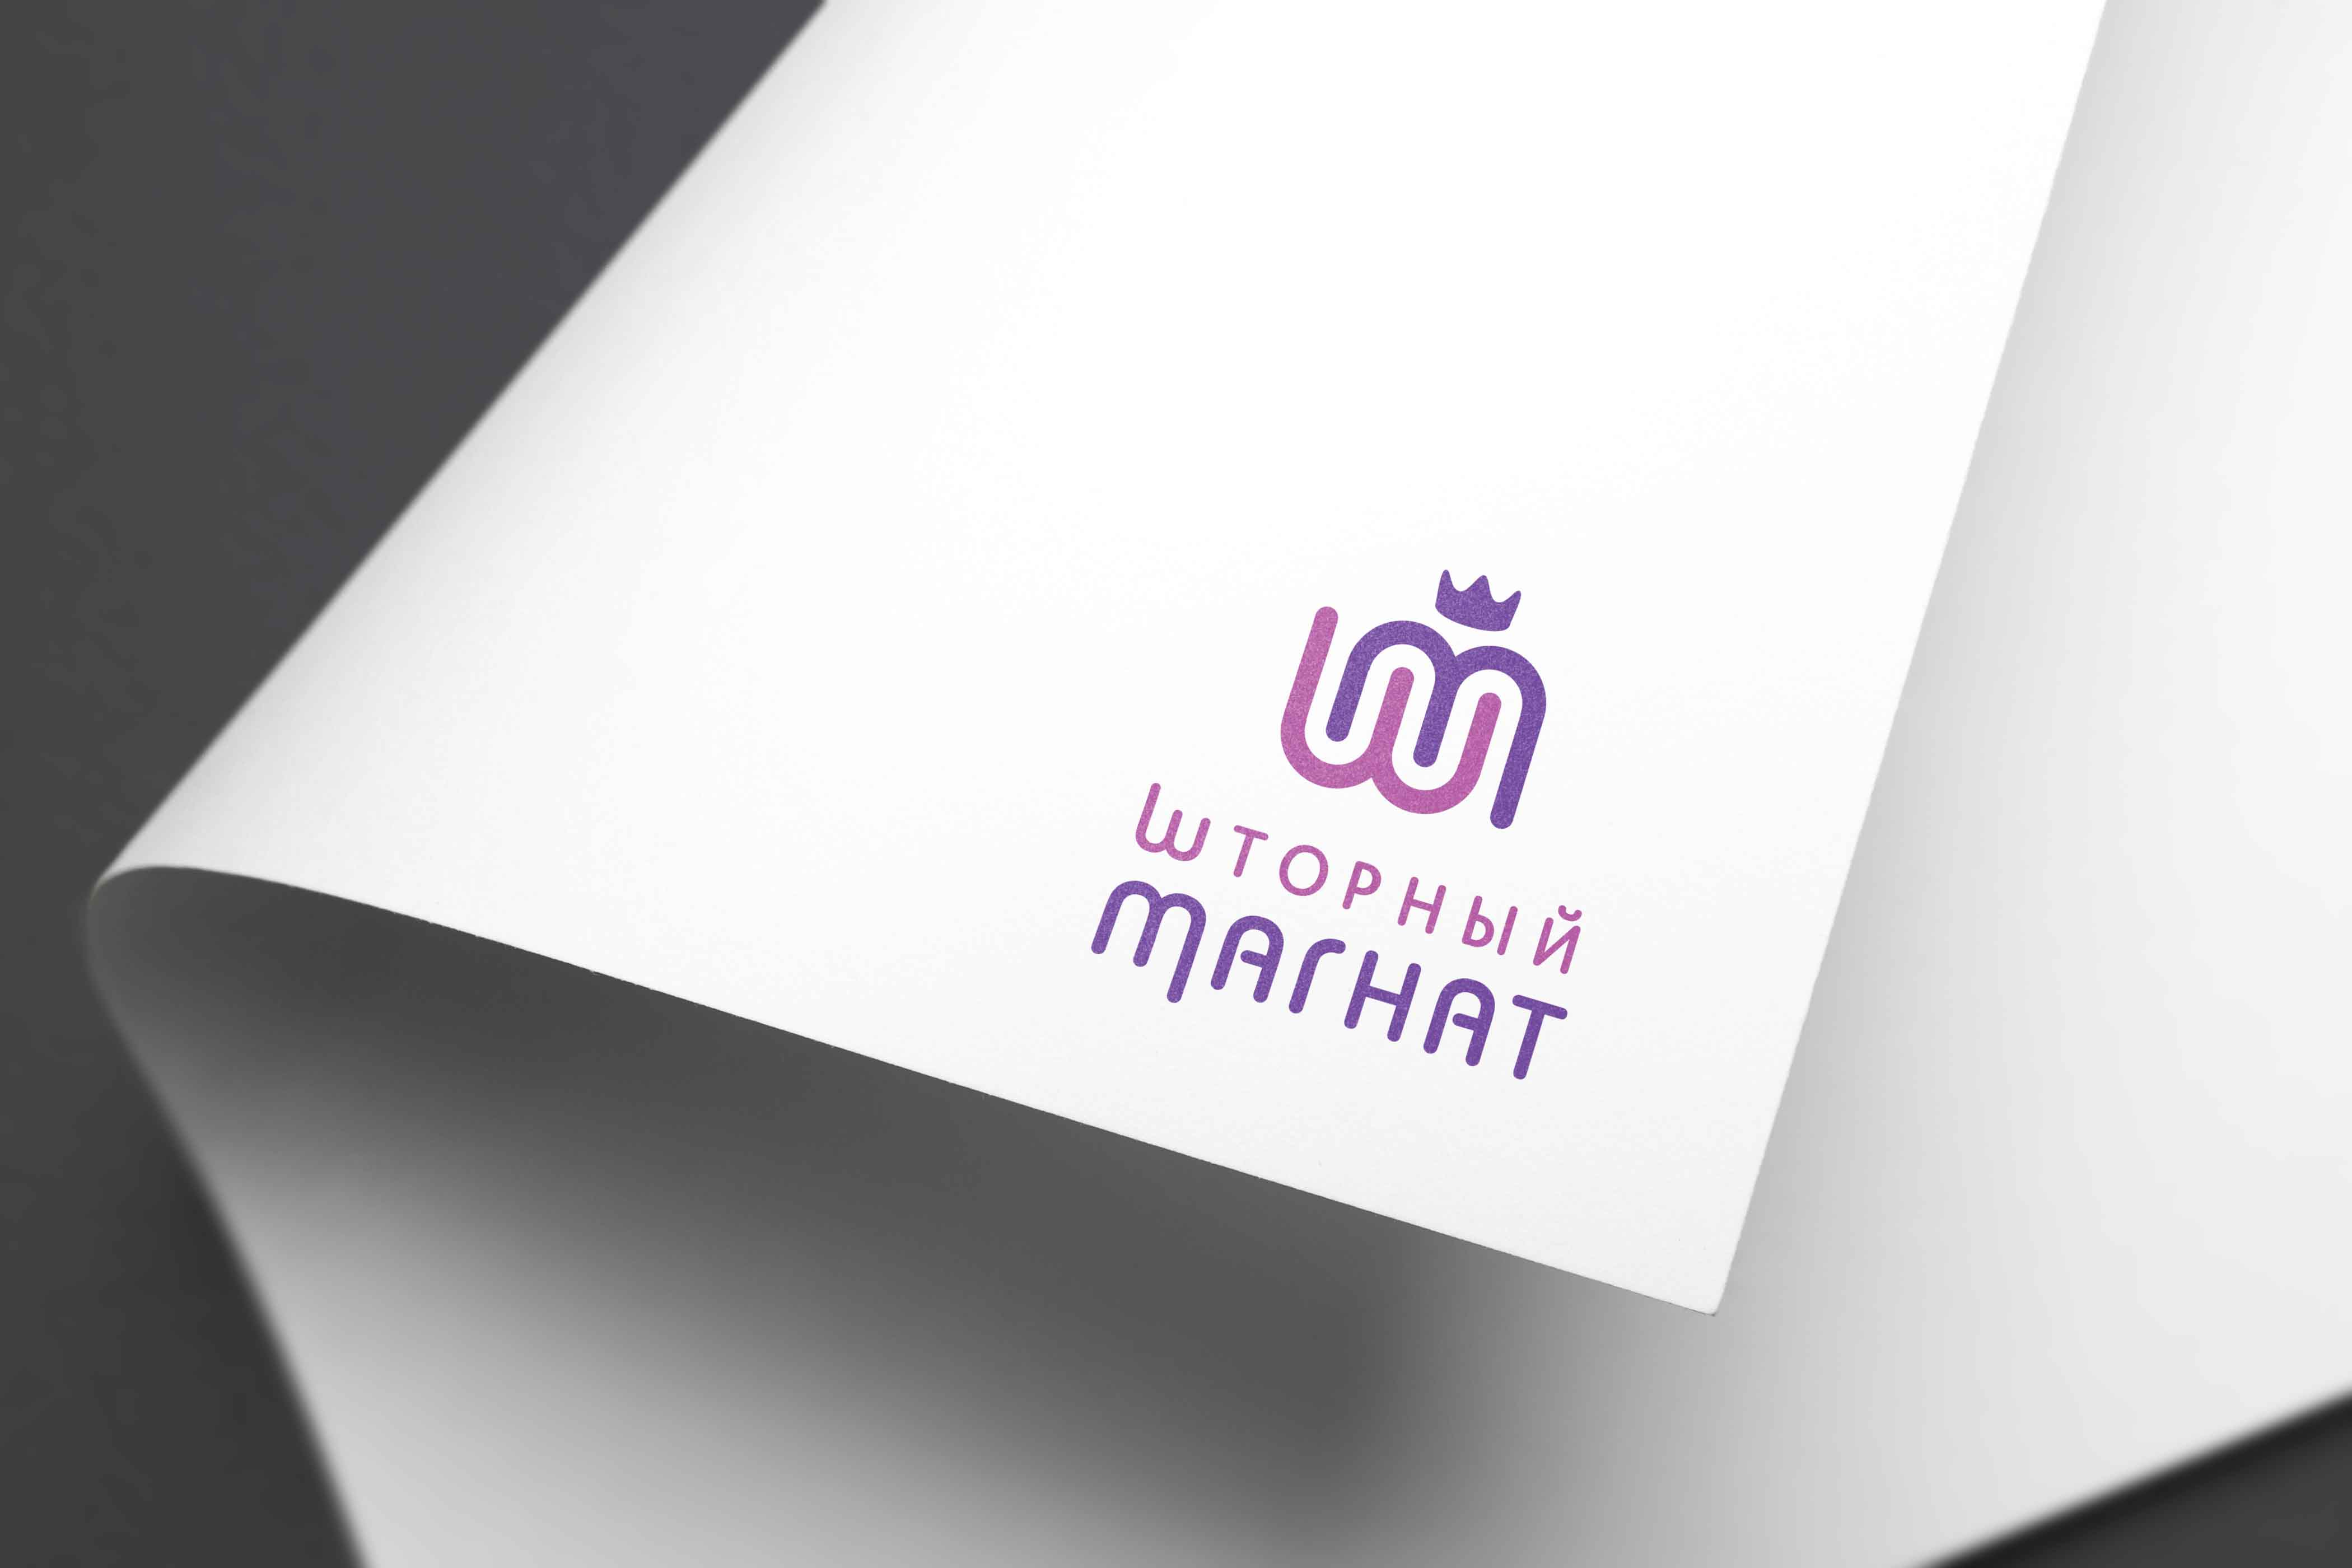 Логотип и фирменный стиль для магазина тканей. фото f_6385cddbc168e326.jpg